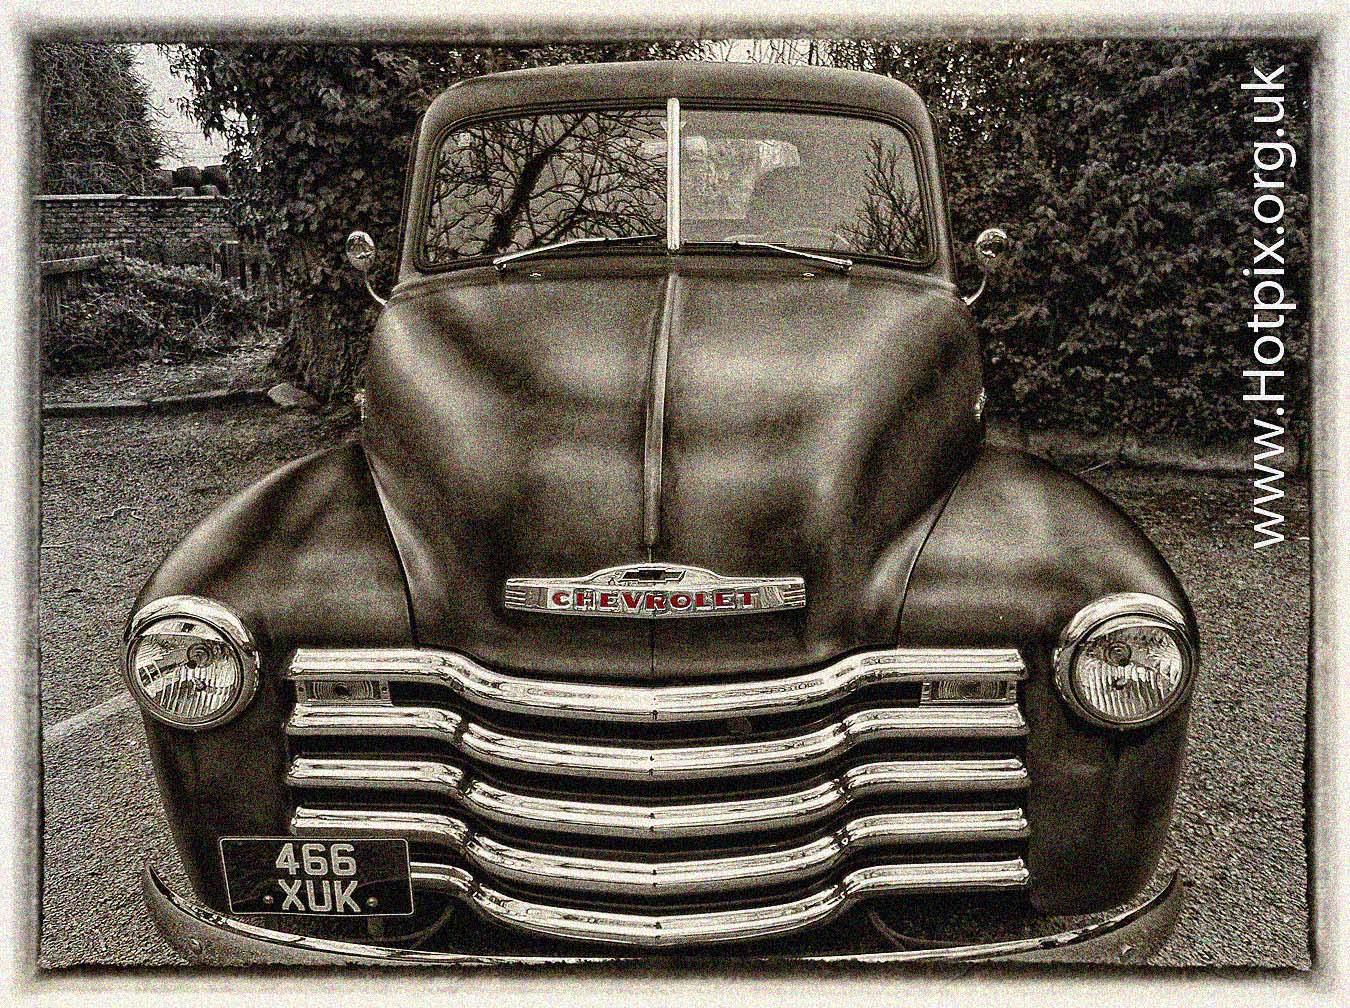 466XUK,1949,Chevrolet,5.7,Litre,Pick-up,car,truck,chevy,dunham,massey,sepia,ipod,shuffle,shuffle2,tonysmith,Tony Smiththat,England,Cheshire,UK